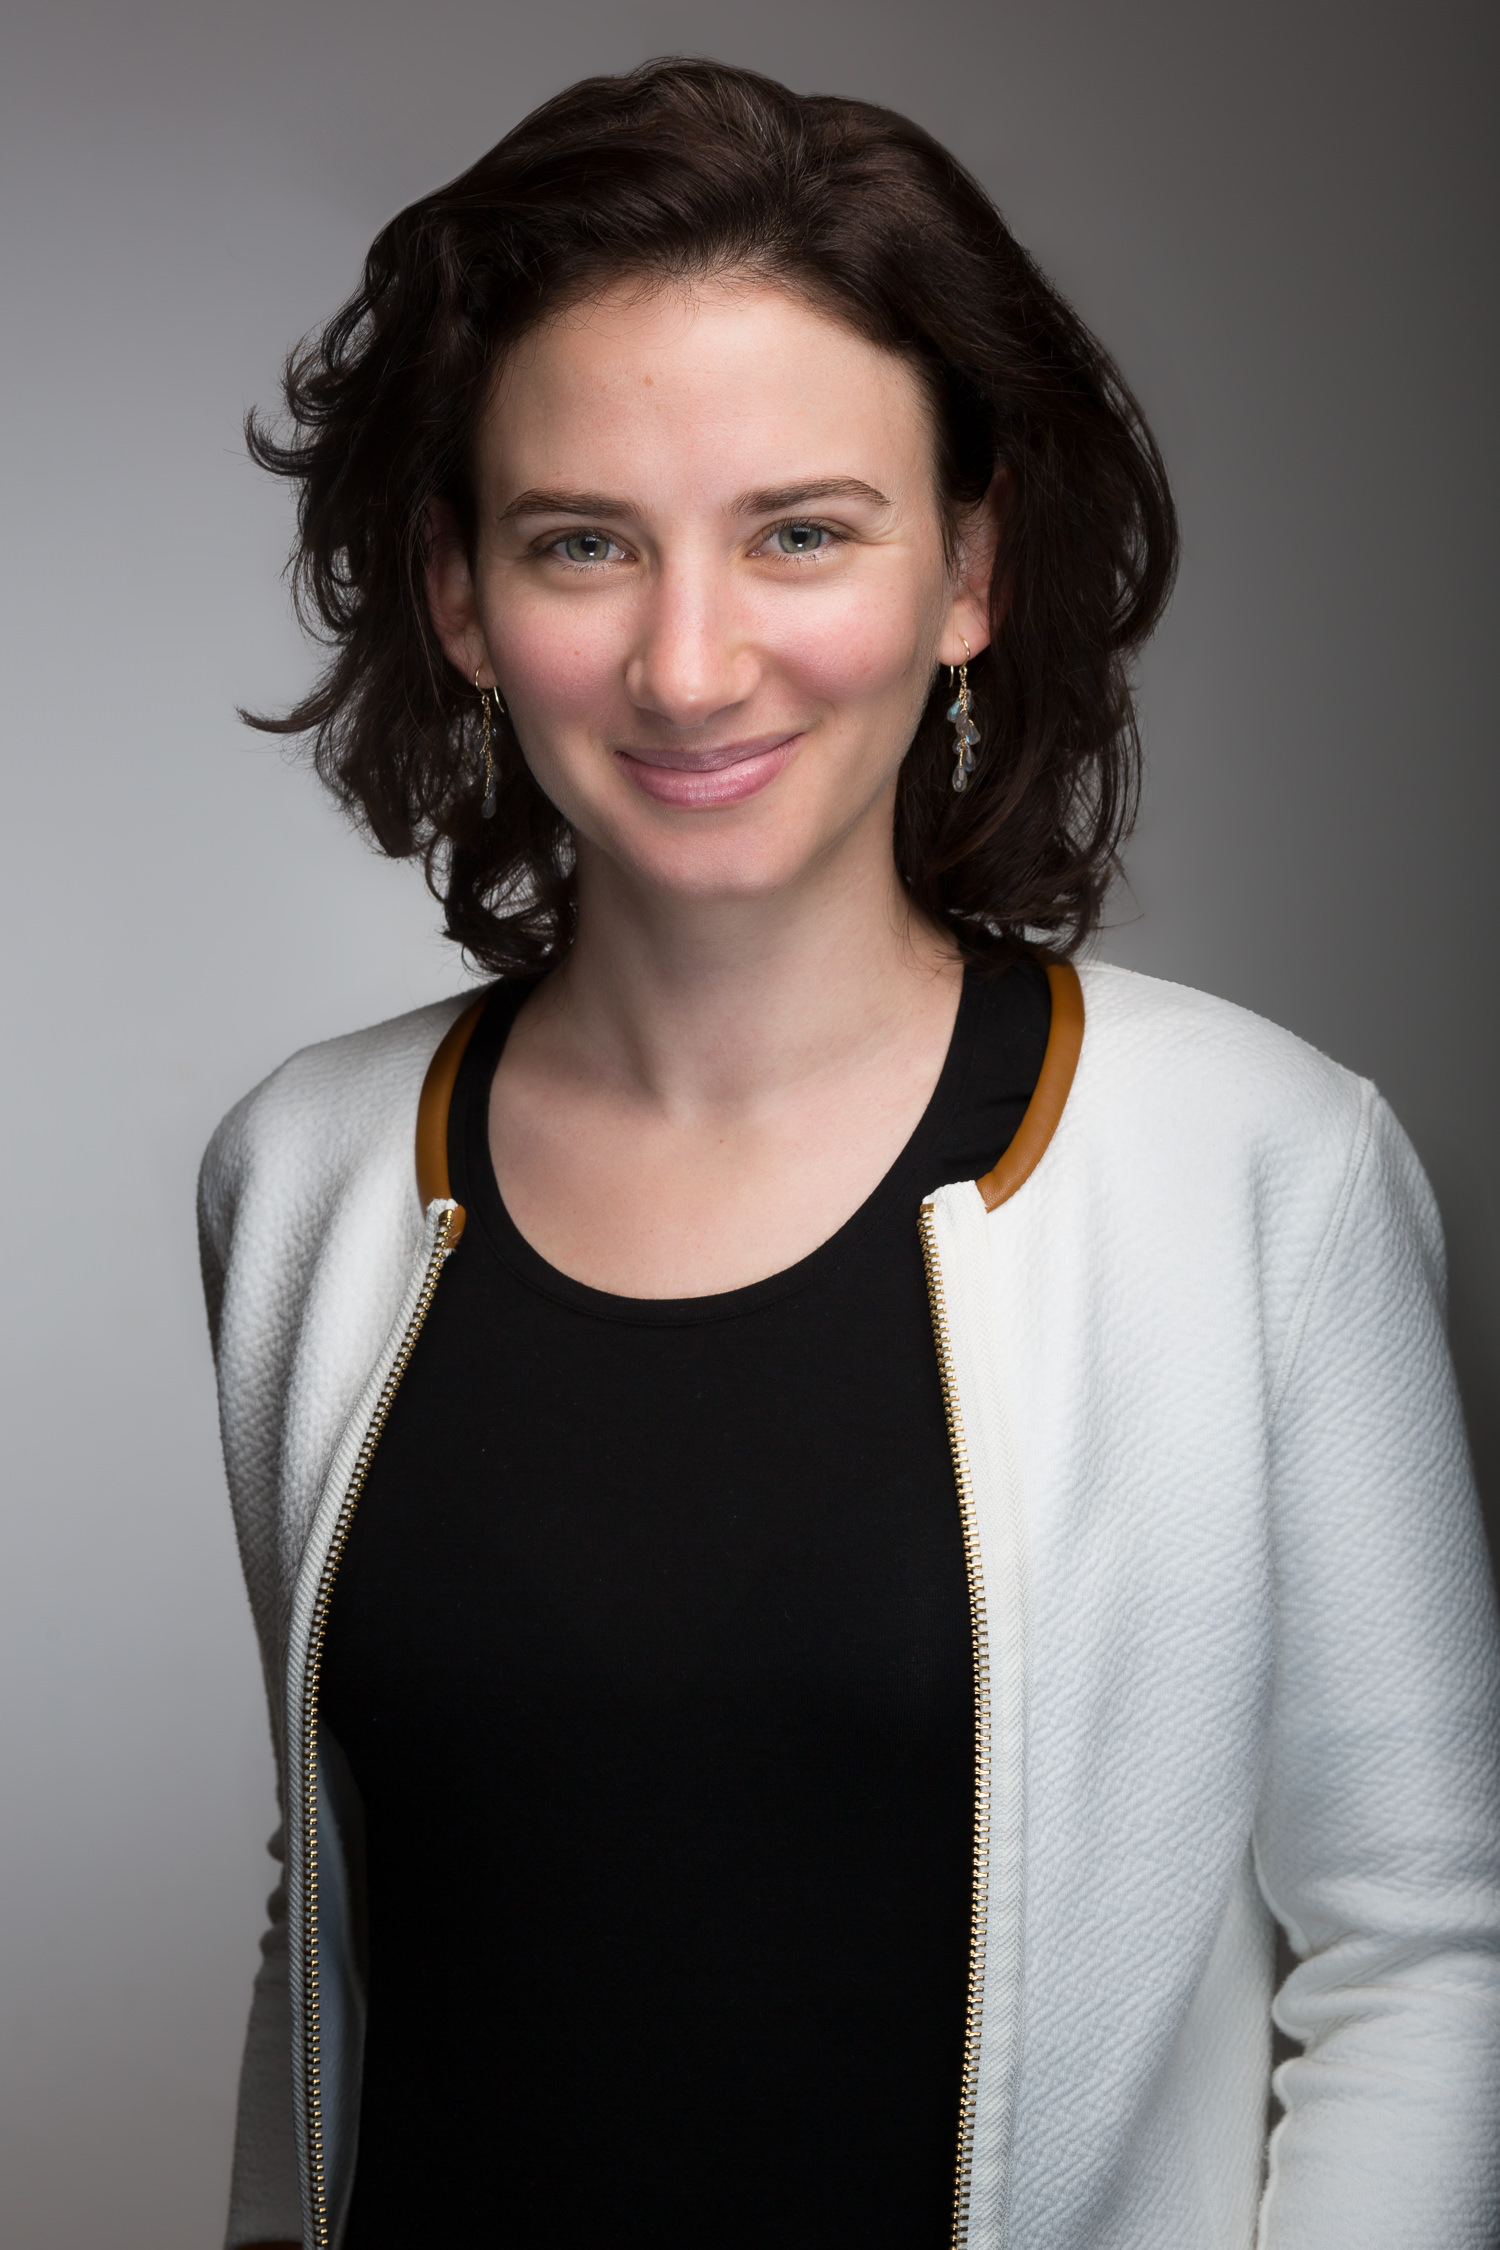 amsterdam-headshot-portrait-portret-bedrijf-zakelijk-mark-hadden-photographer-fotograaf-102.jpg